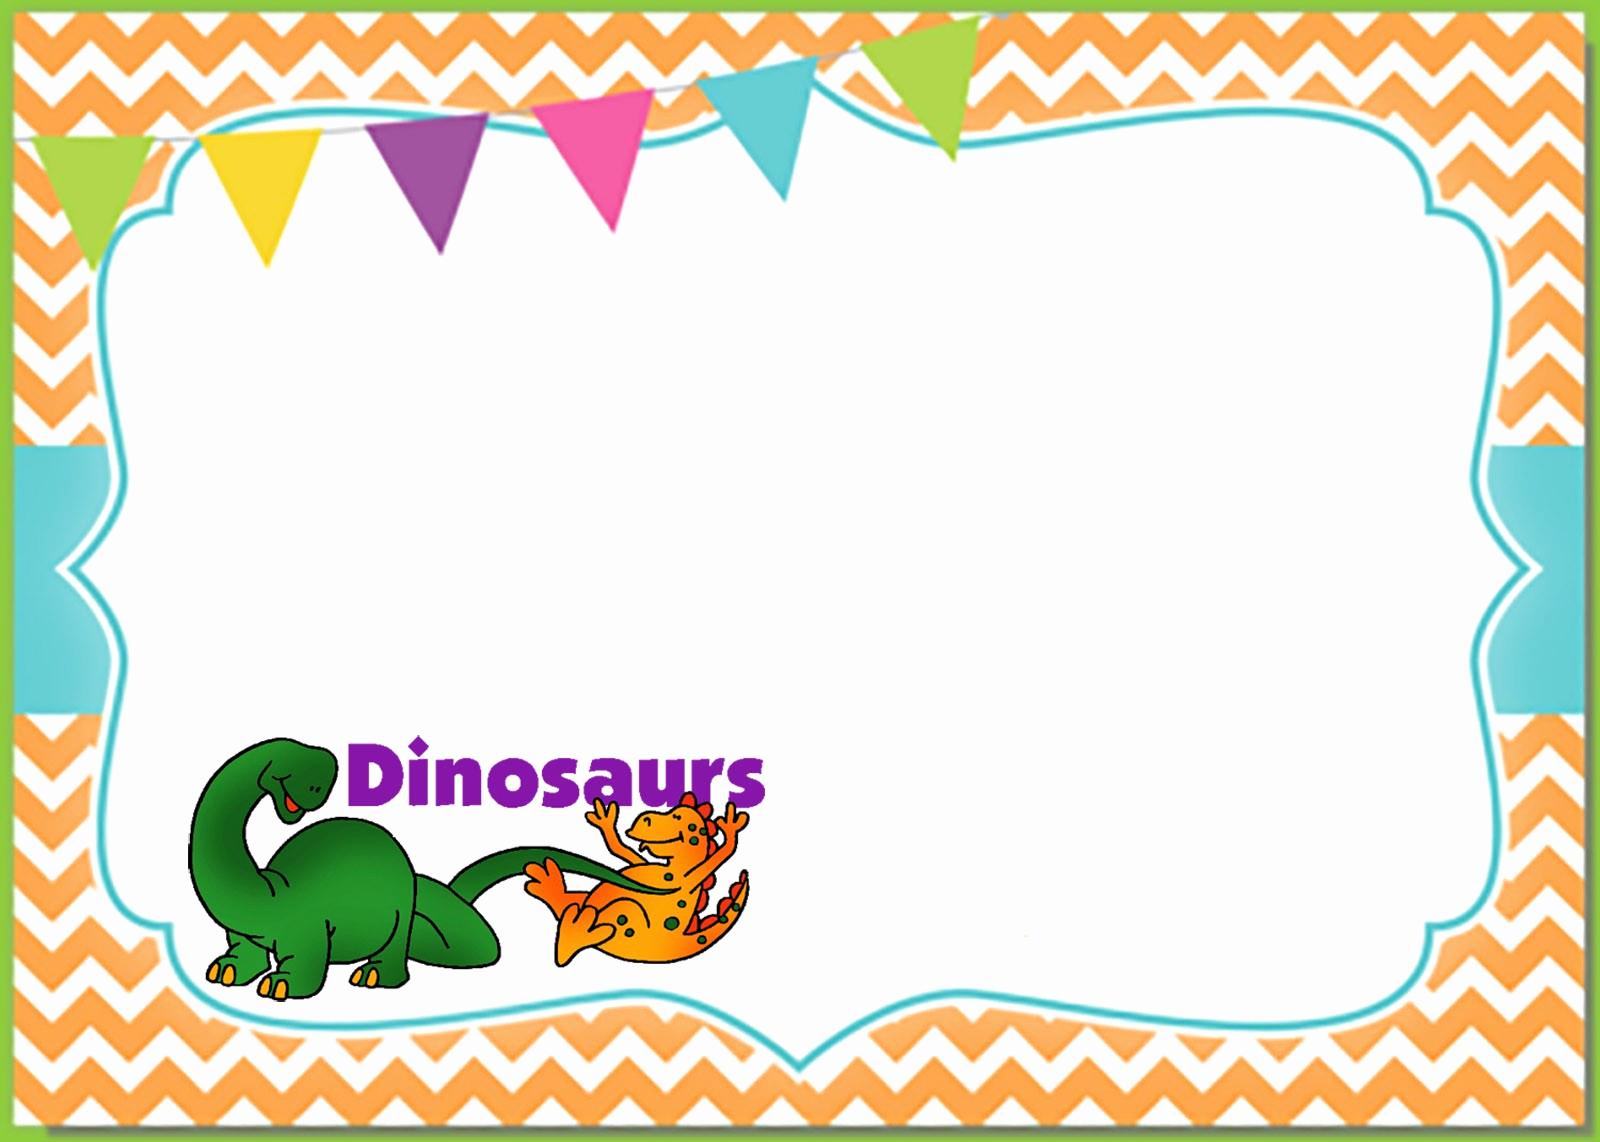 Dinosaur Birthday Invitation Template Lovely 6 Printable Invitation Templates for A Dinosaur Birthday